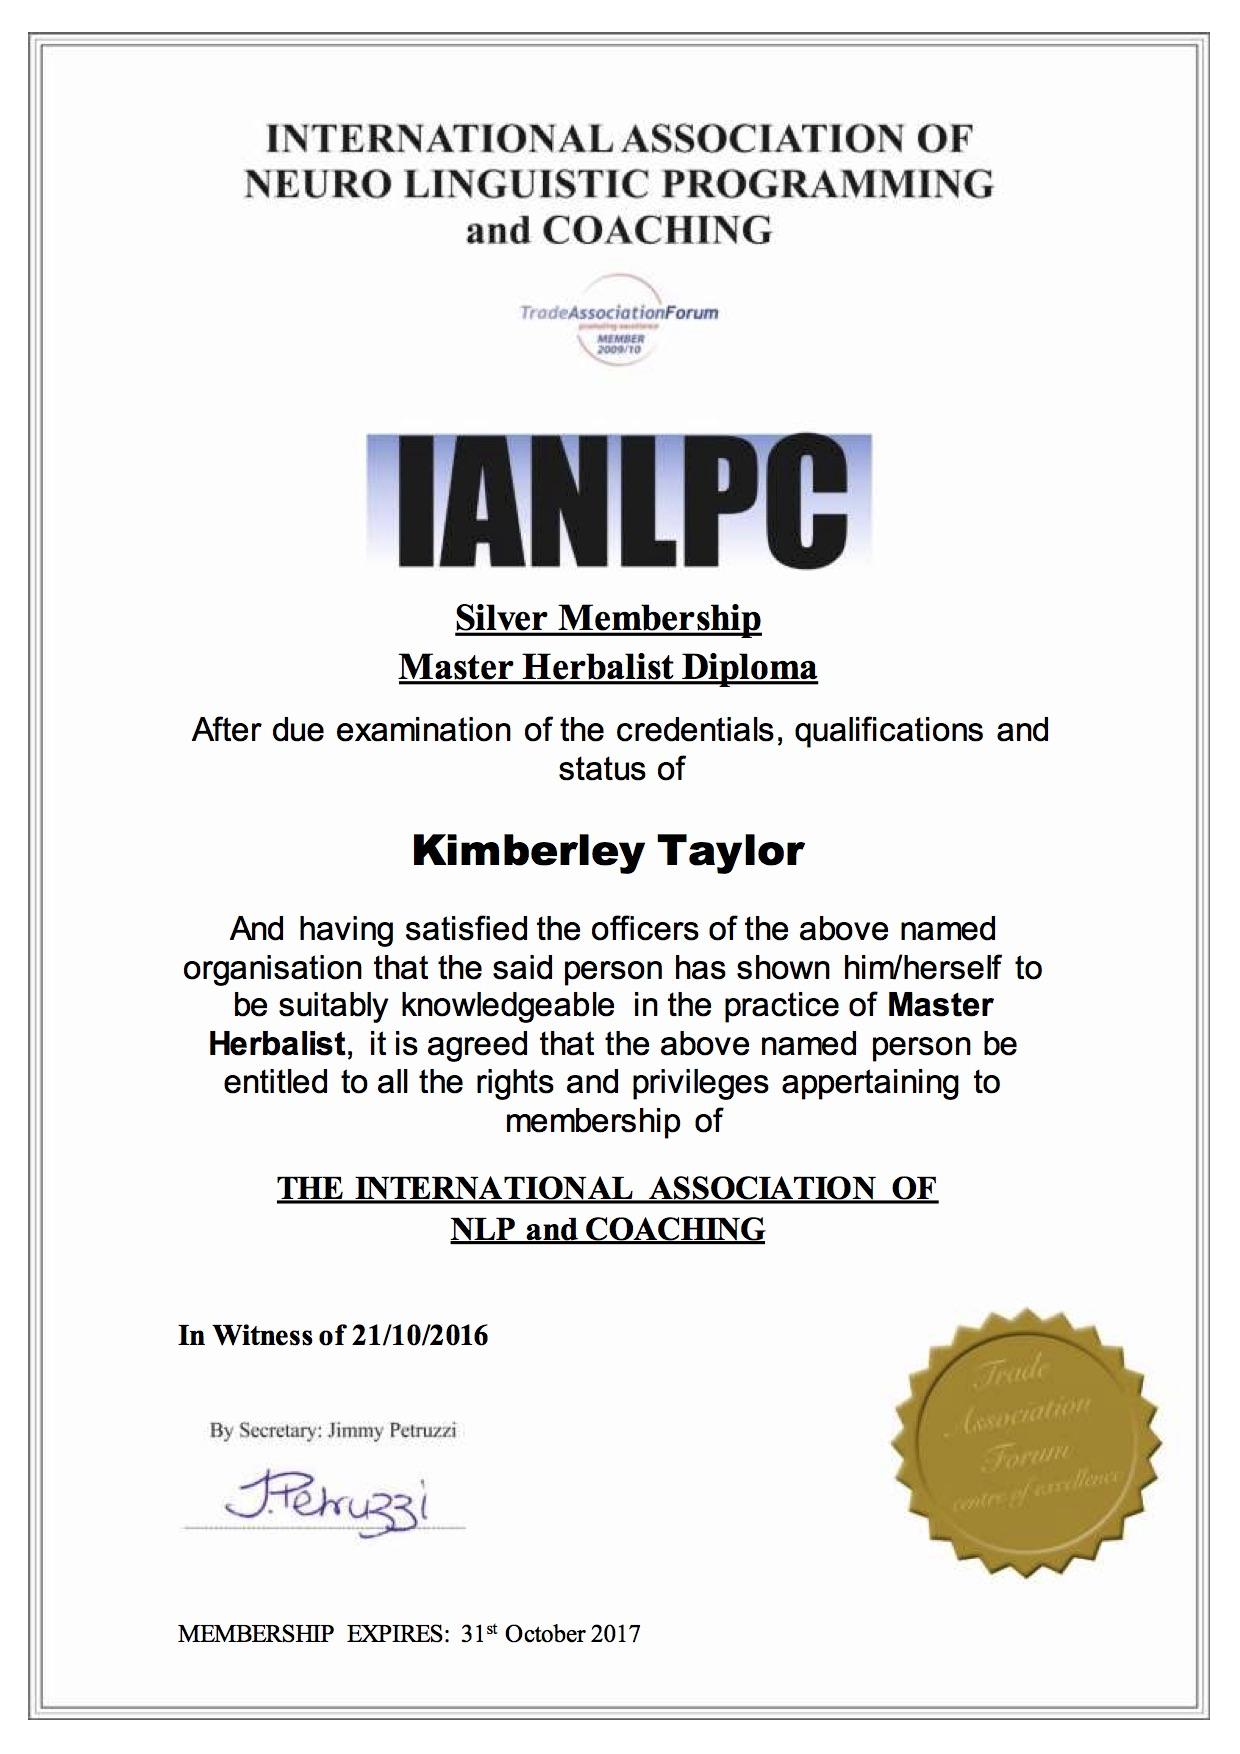 IANLPC_Master_Herbalist_Diploma_Kimberley_Taylor